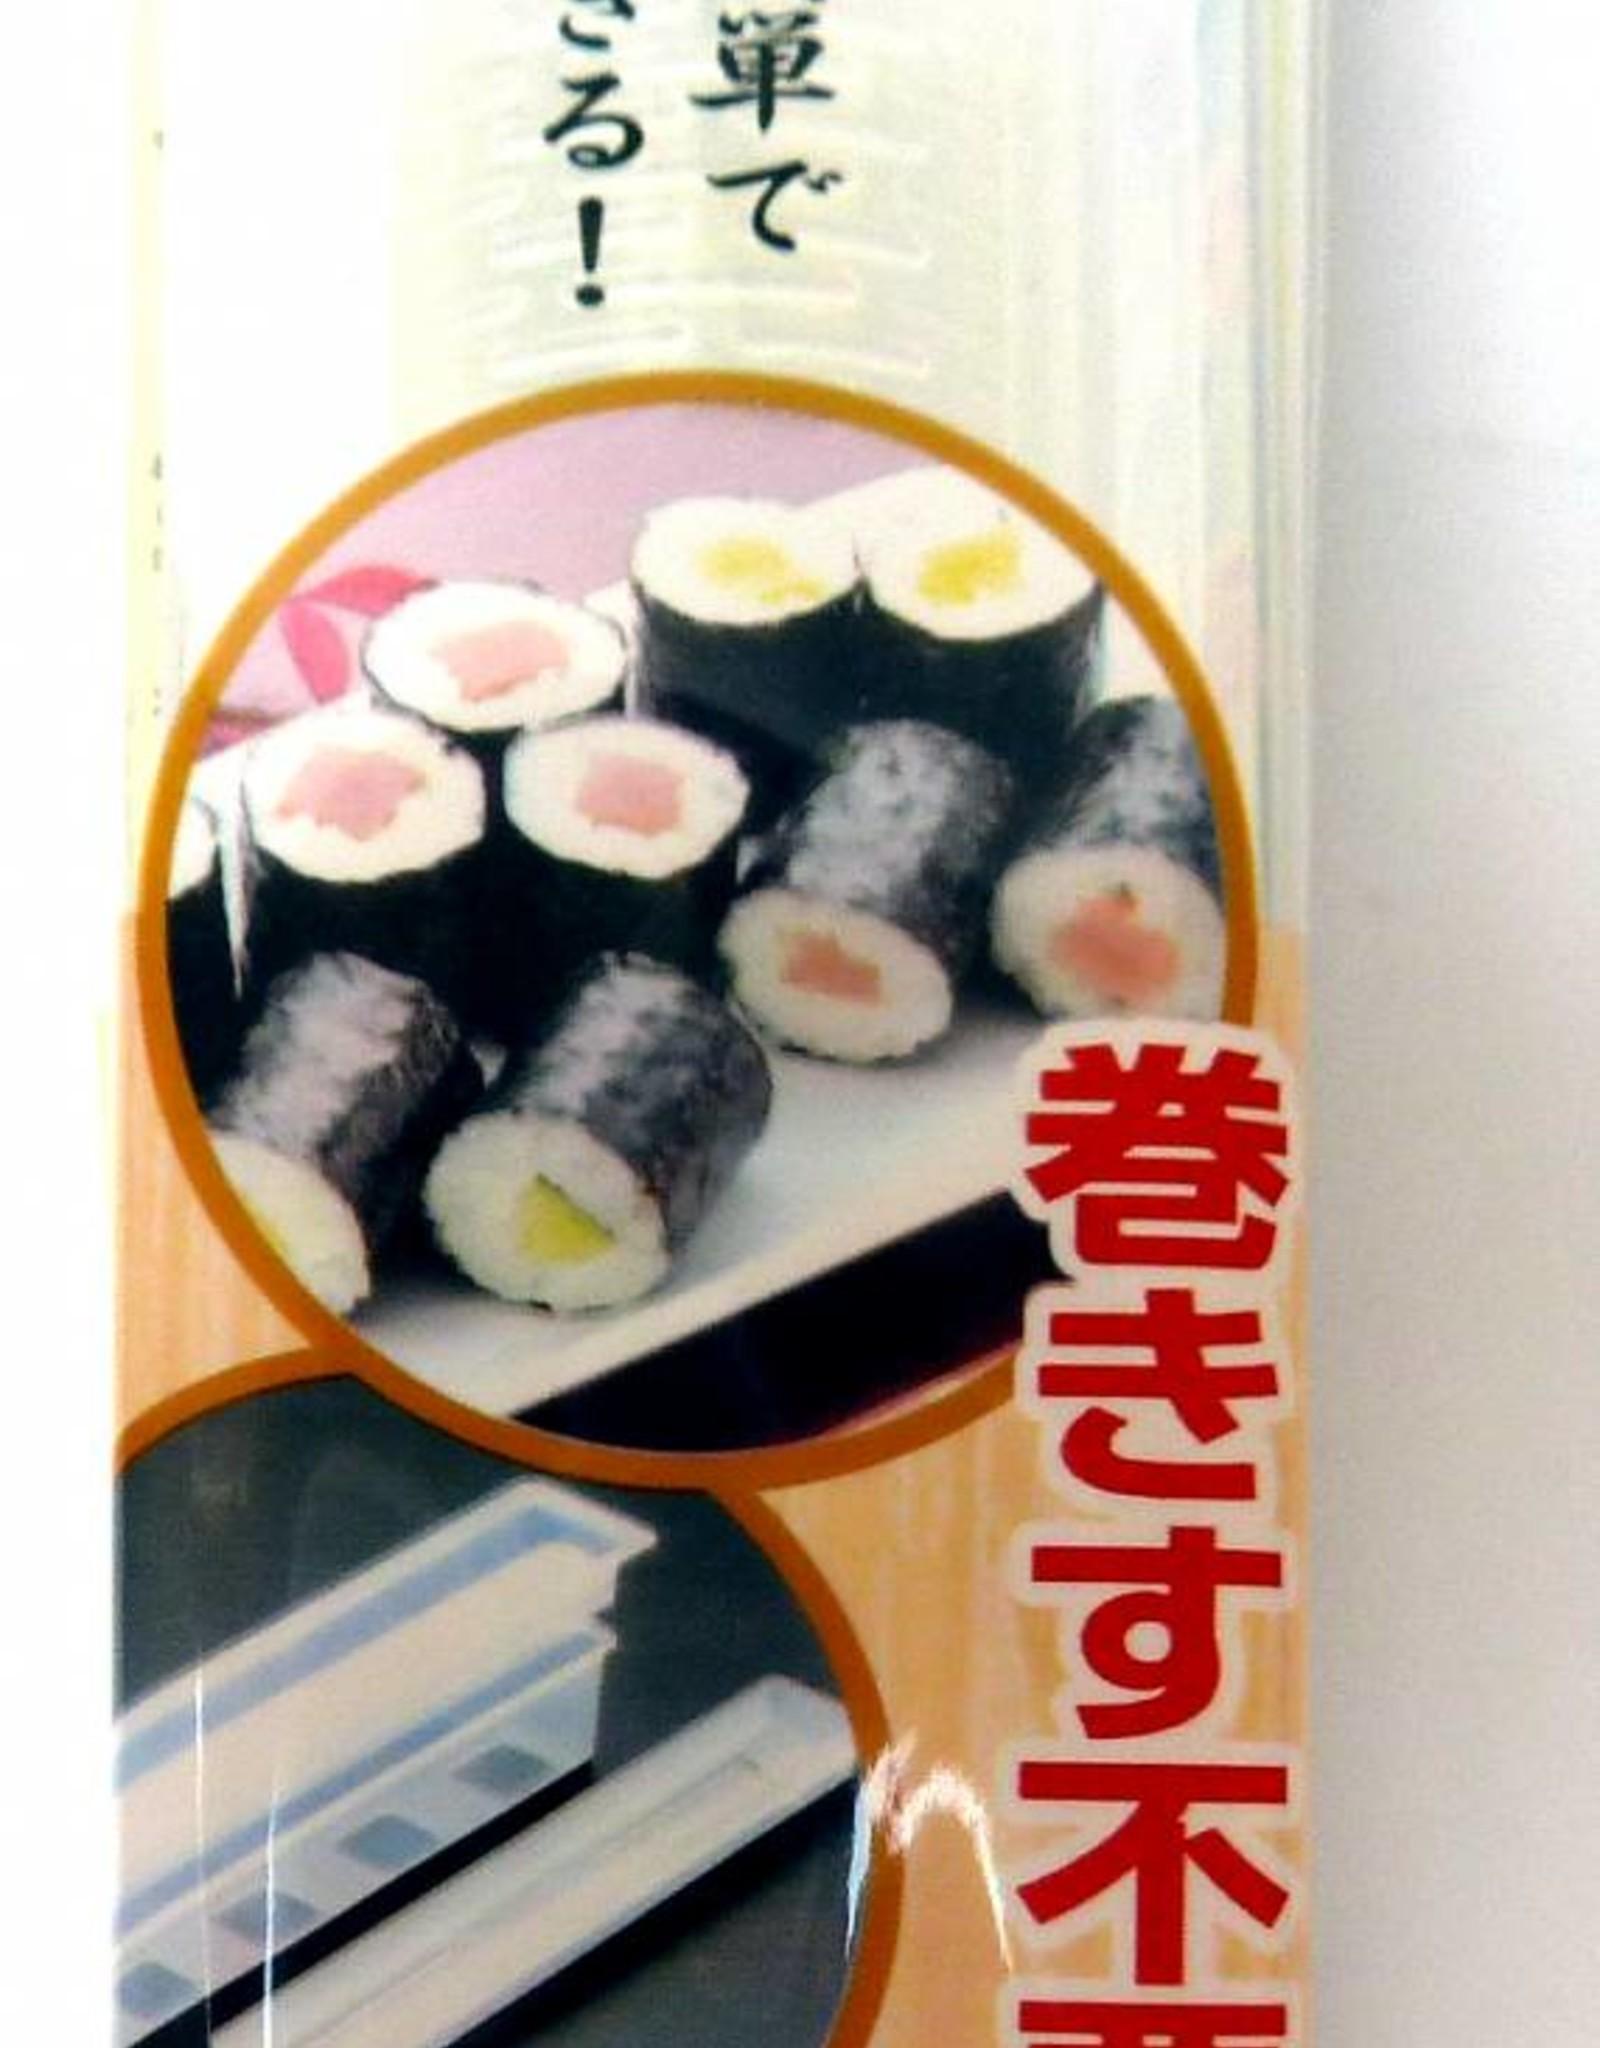 Tokyo Design Studio Sushi form for narrow sushi maki